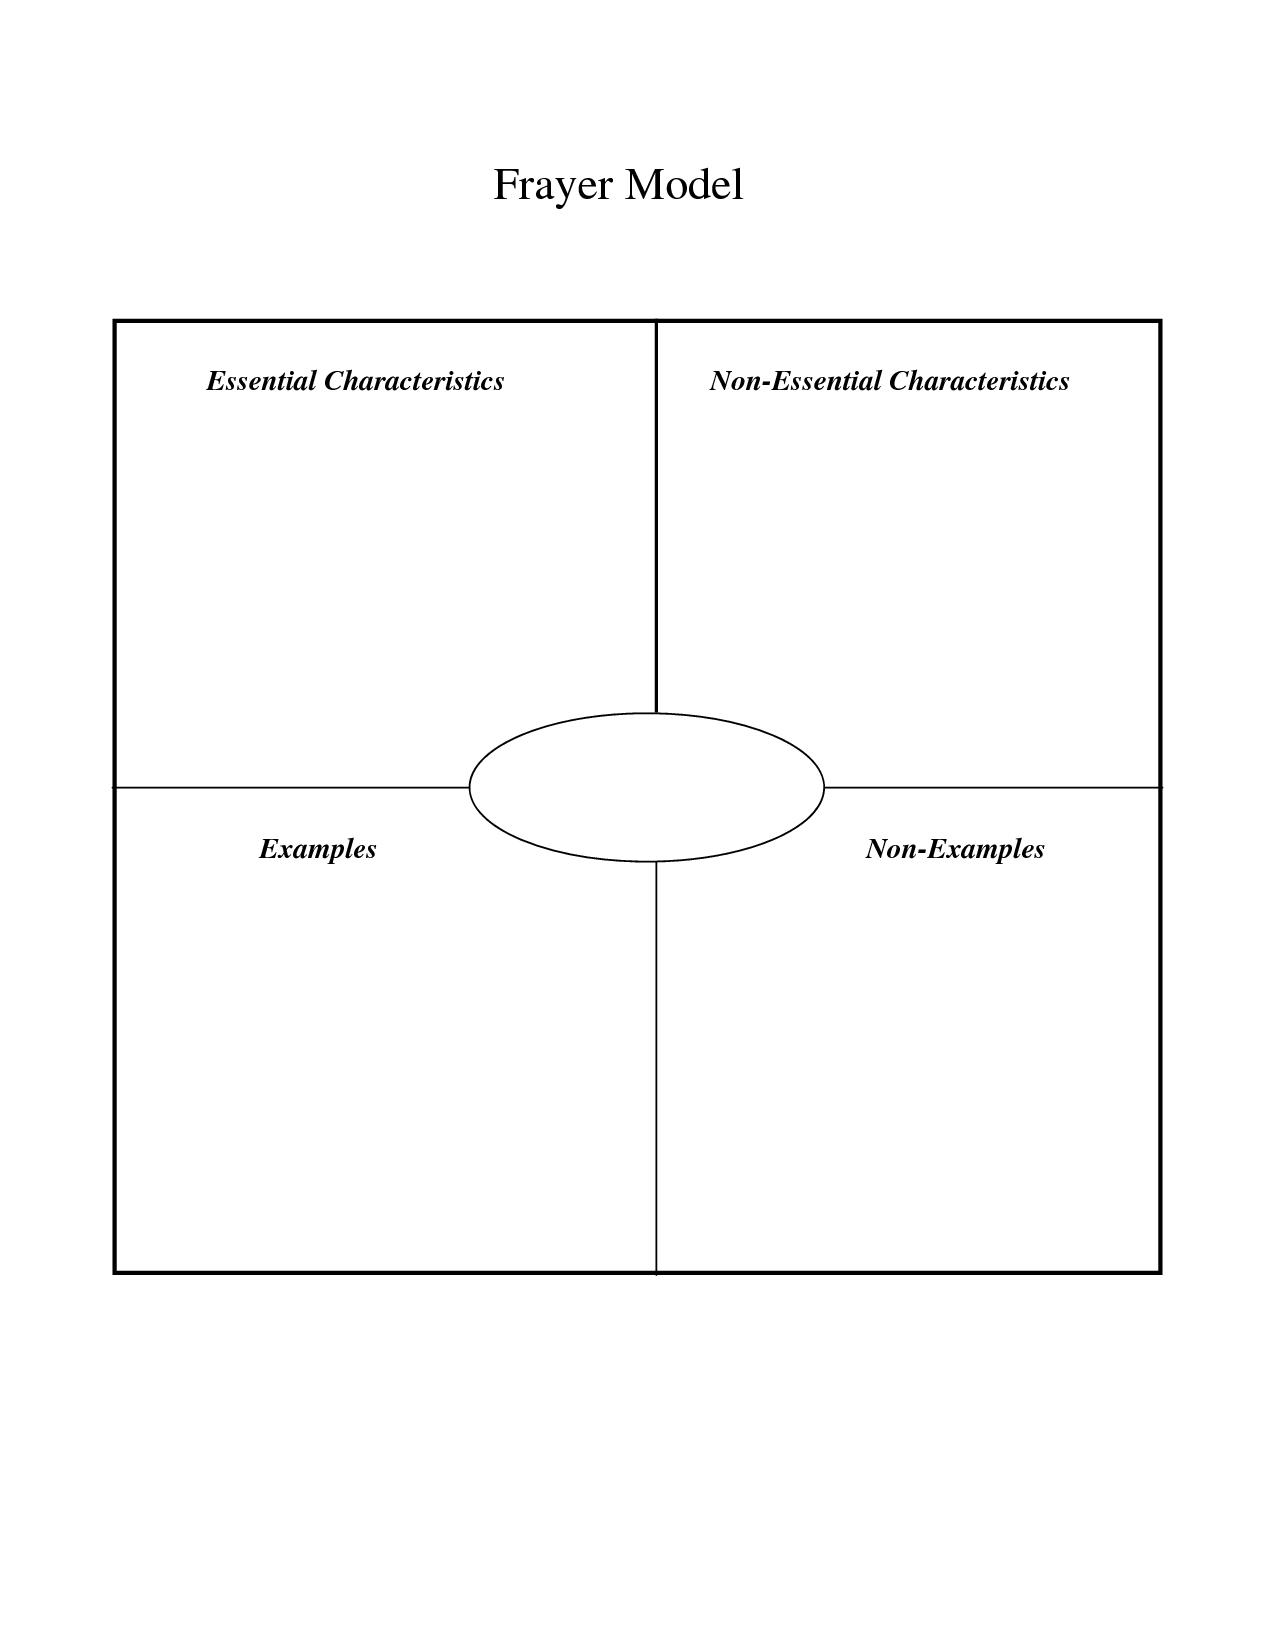 web diagram graphic organizer lx torana tacho wiring 12 blank organizers images printable